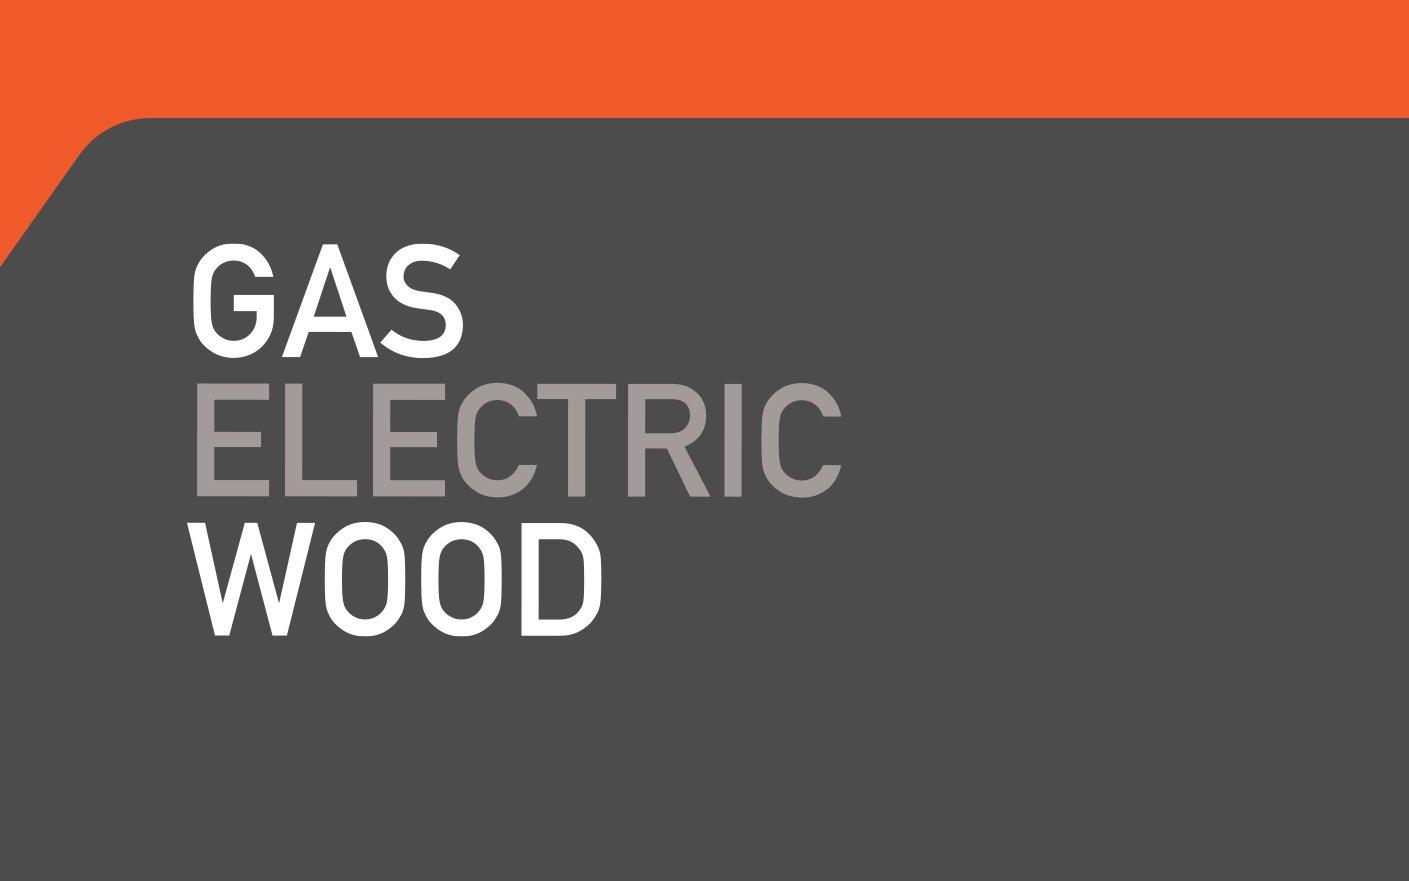 Gas Electric Stove Branding